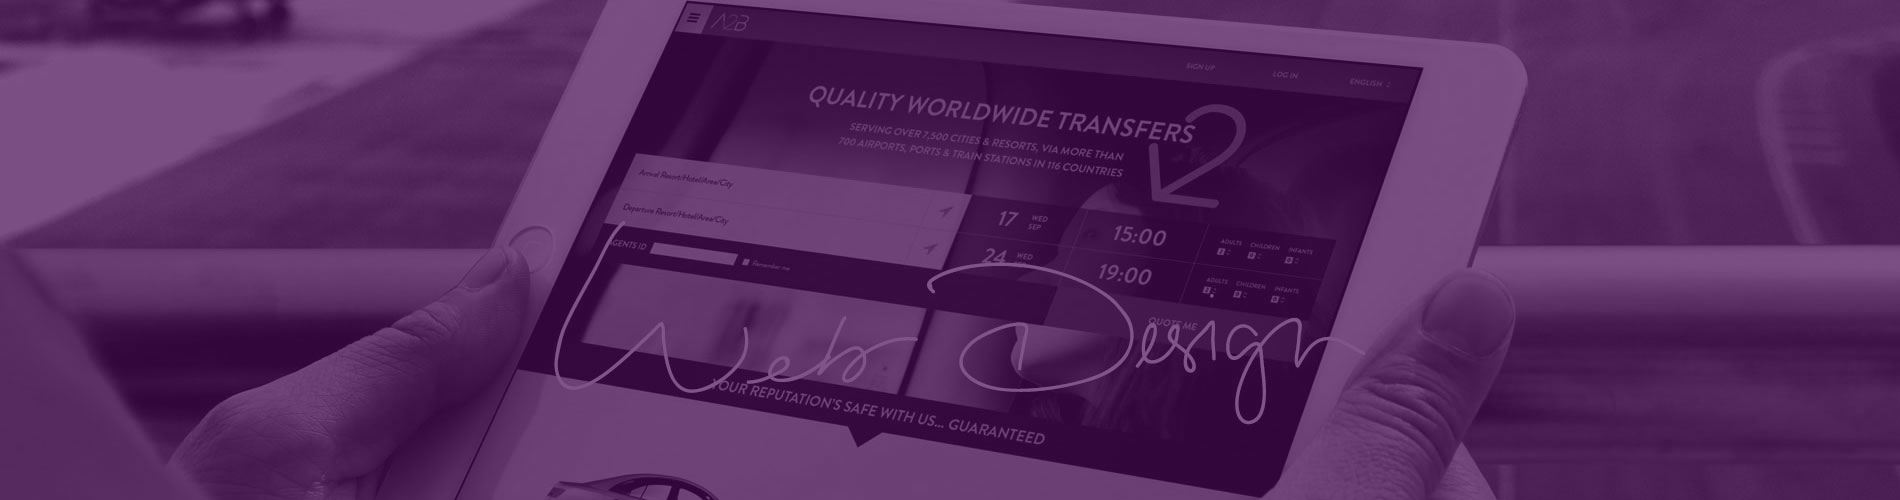 Web Design Companies in Qatar | Web Design Doha Qatar